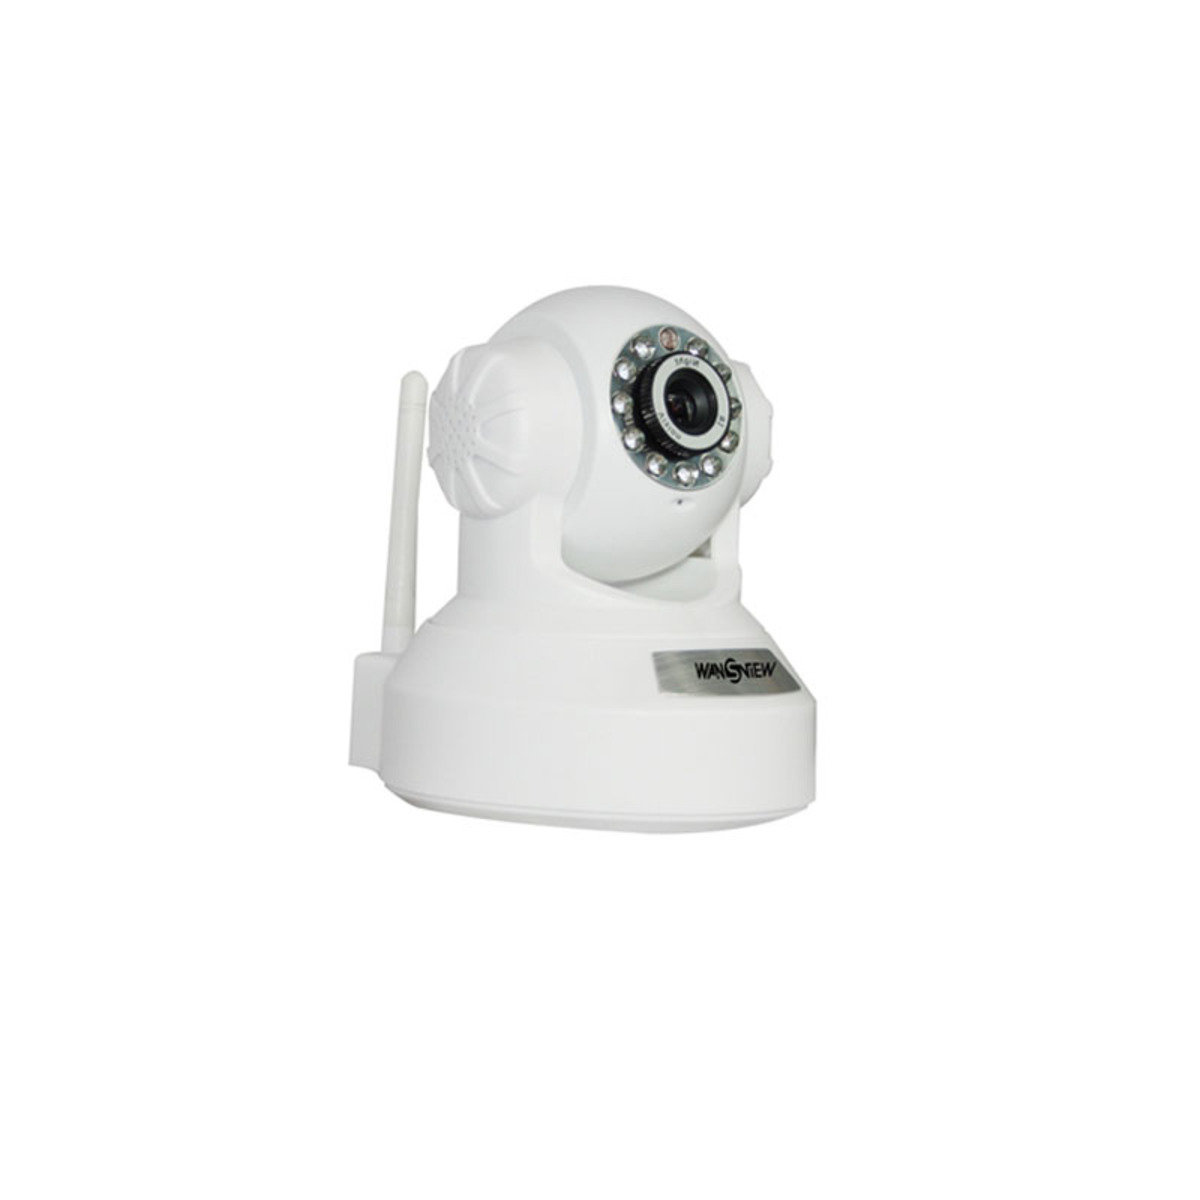 720p 高清旋轉式多角度無線網路攝影機 NCM630GB 白色